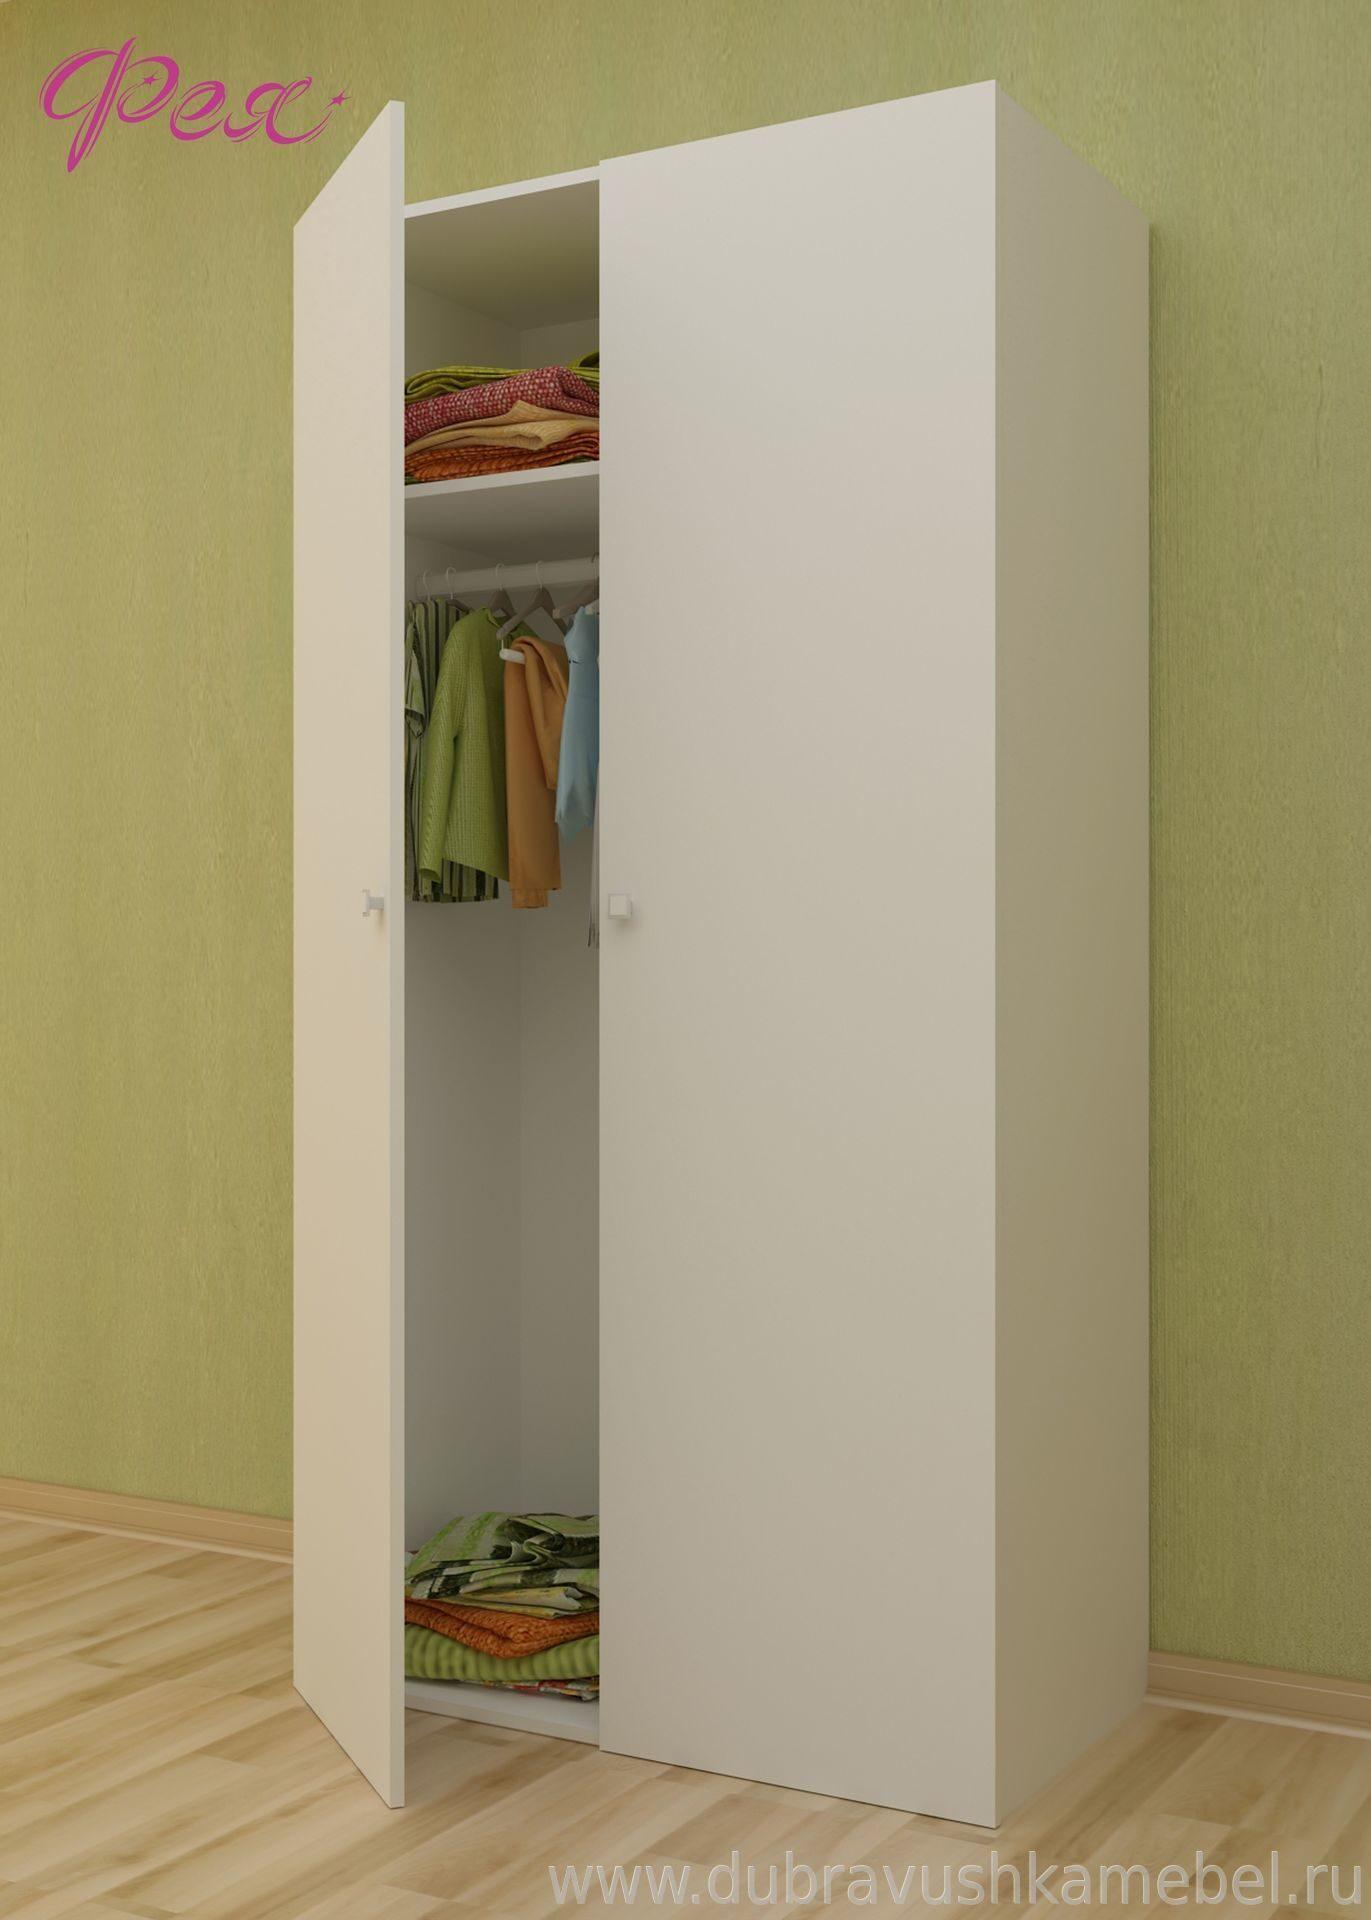 Шкаф 2-х секционный феЯ белый 0001070.9 магазин boy-toys.ru.